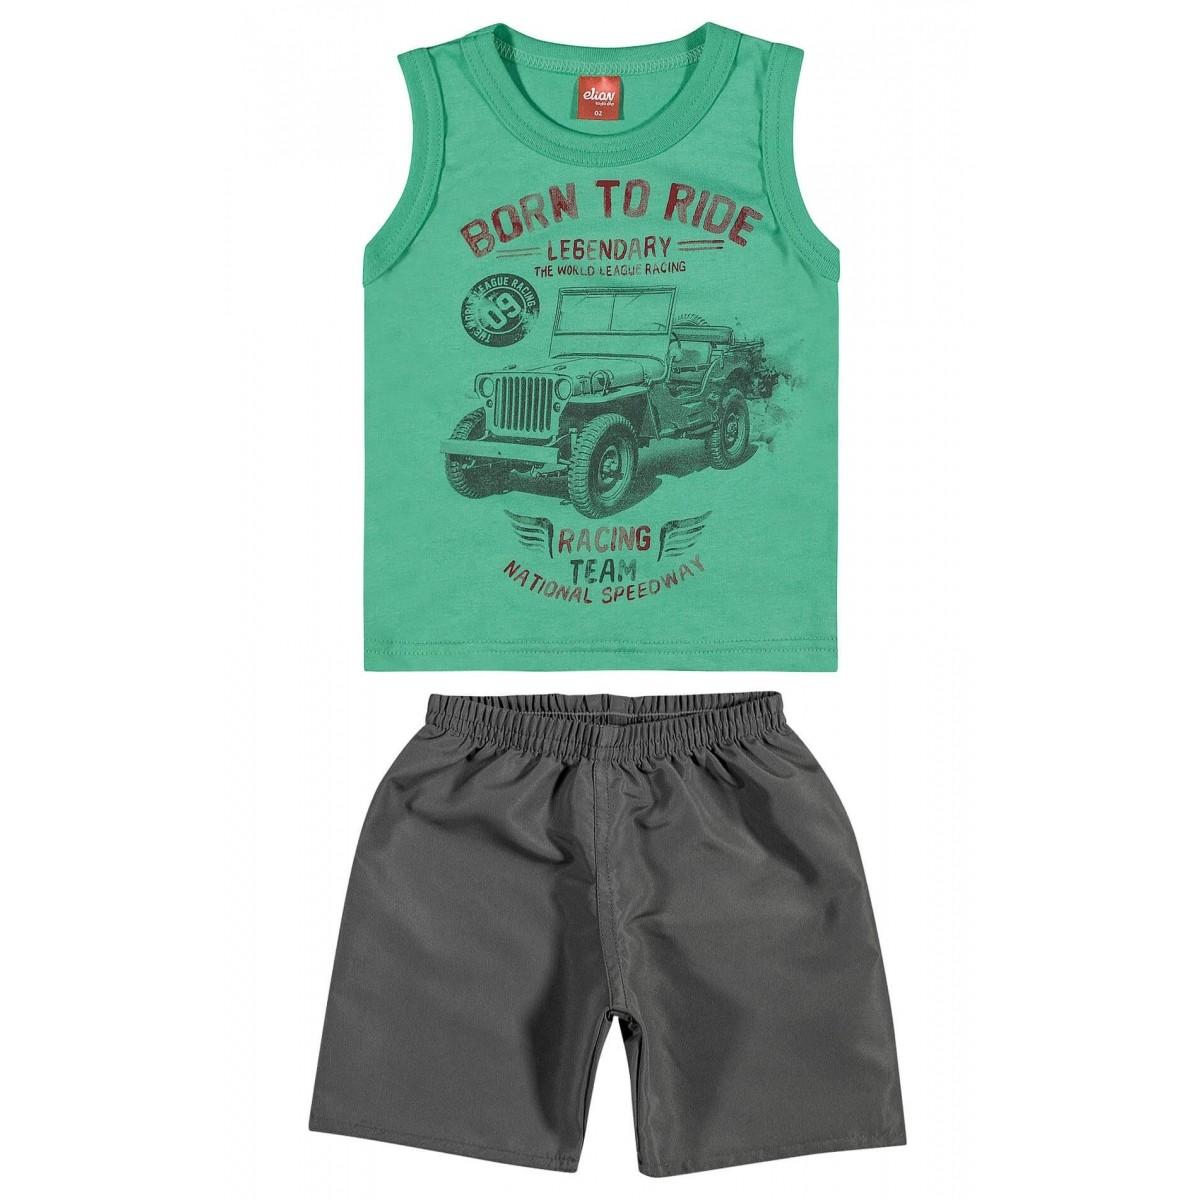 Conjunto Masculino Infantil Verde Born to Ride Elian